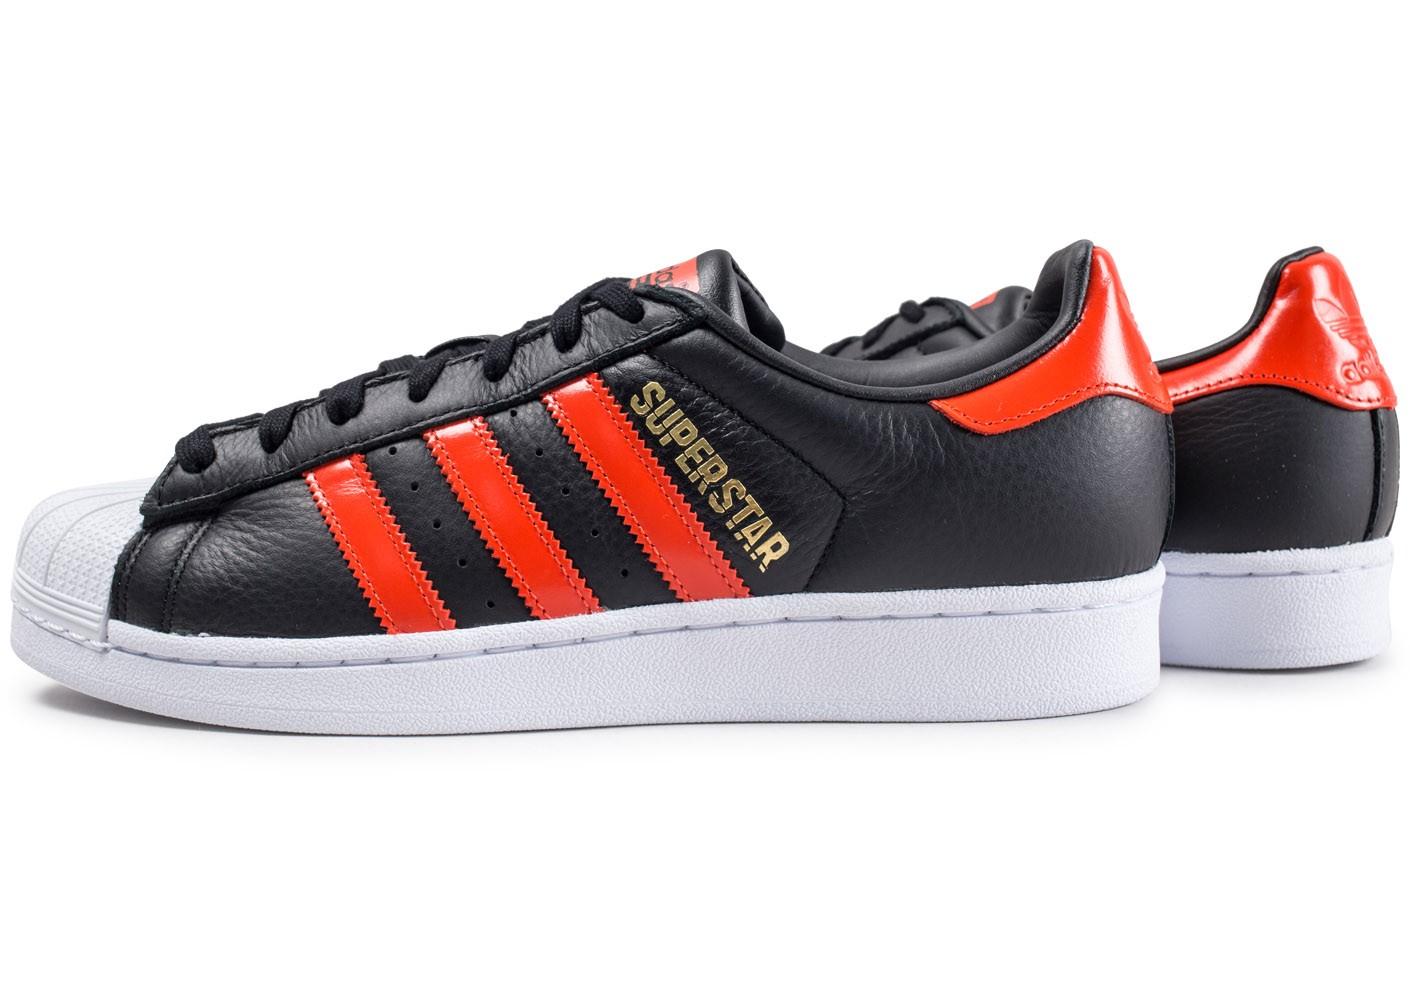 acheter en ligne 20185 ef688 adidas superstar noir et rouge